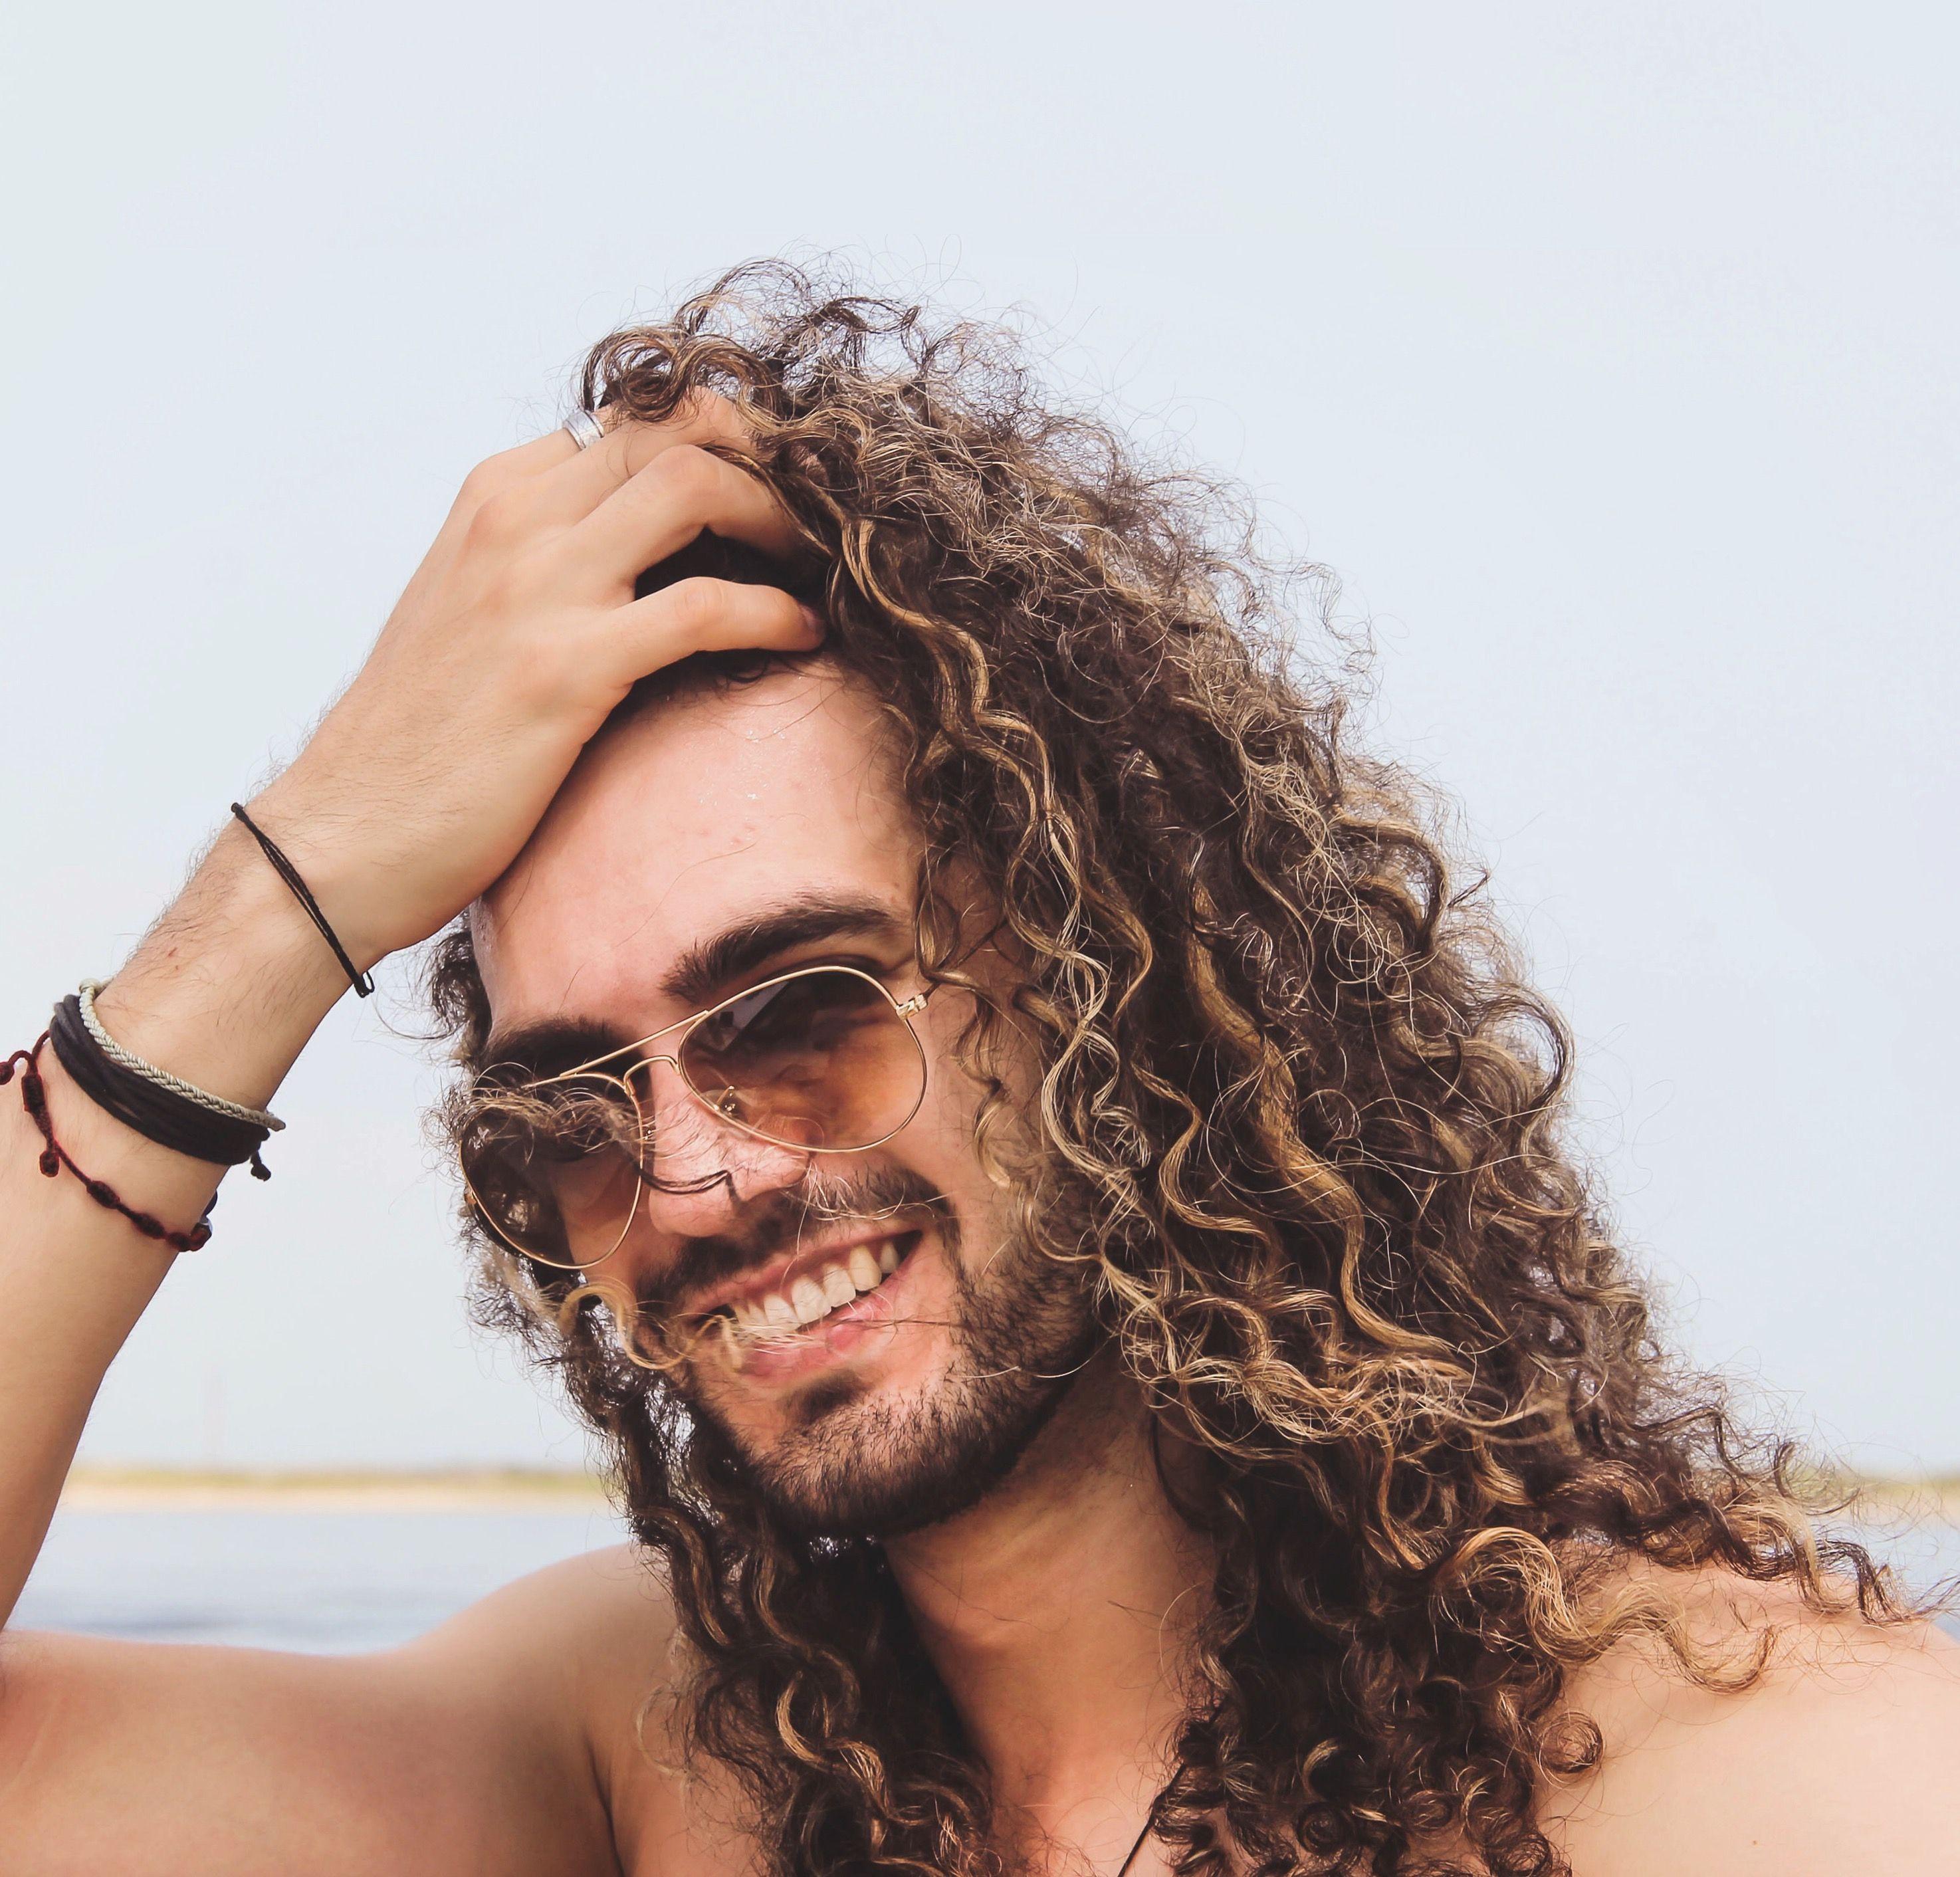 Curlyhair Curls Man With Curls Longhair Man Long Hairstyle For Man Man Bun Beard Highlights Man Beach Long Hair Styles Men Long Curly Hair Men Mens Hairstyles